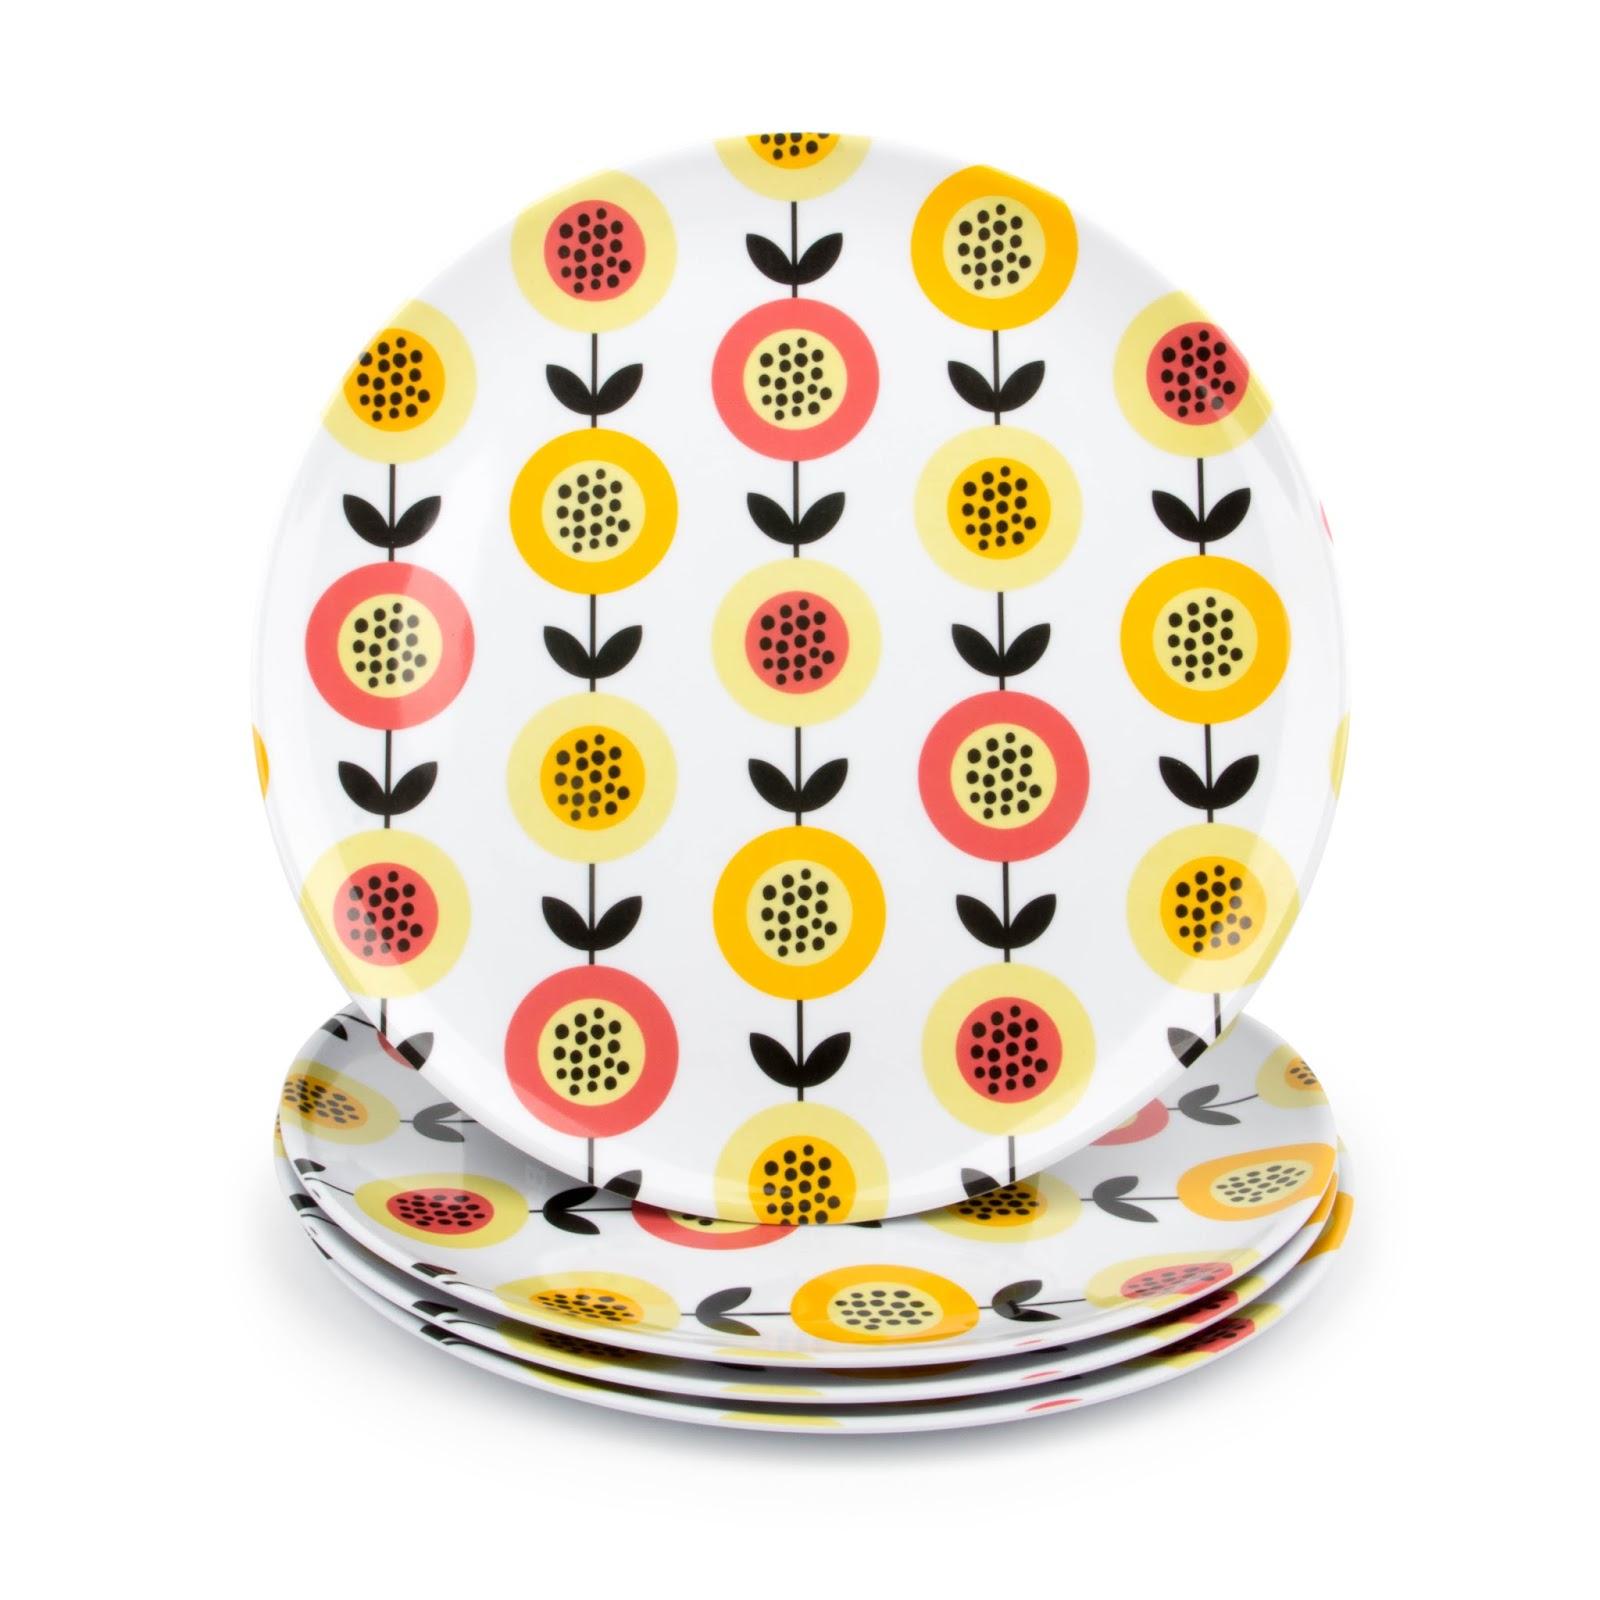 Melamine Picnic / Dinner Plates Set of 4 #theradishstore  sc 1 st  The Aries Man Chronicles & The Aries Man Chronicles: Melamine Picnic / Dinner Plates Set of 4 ...